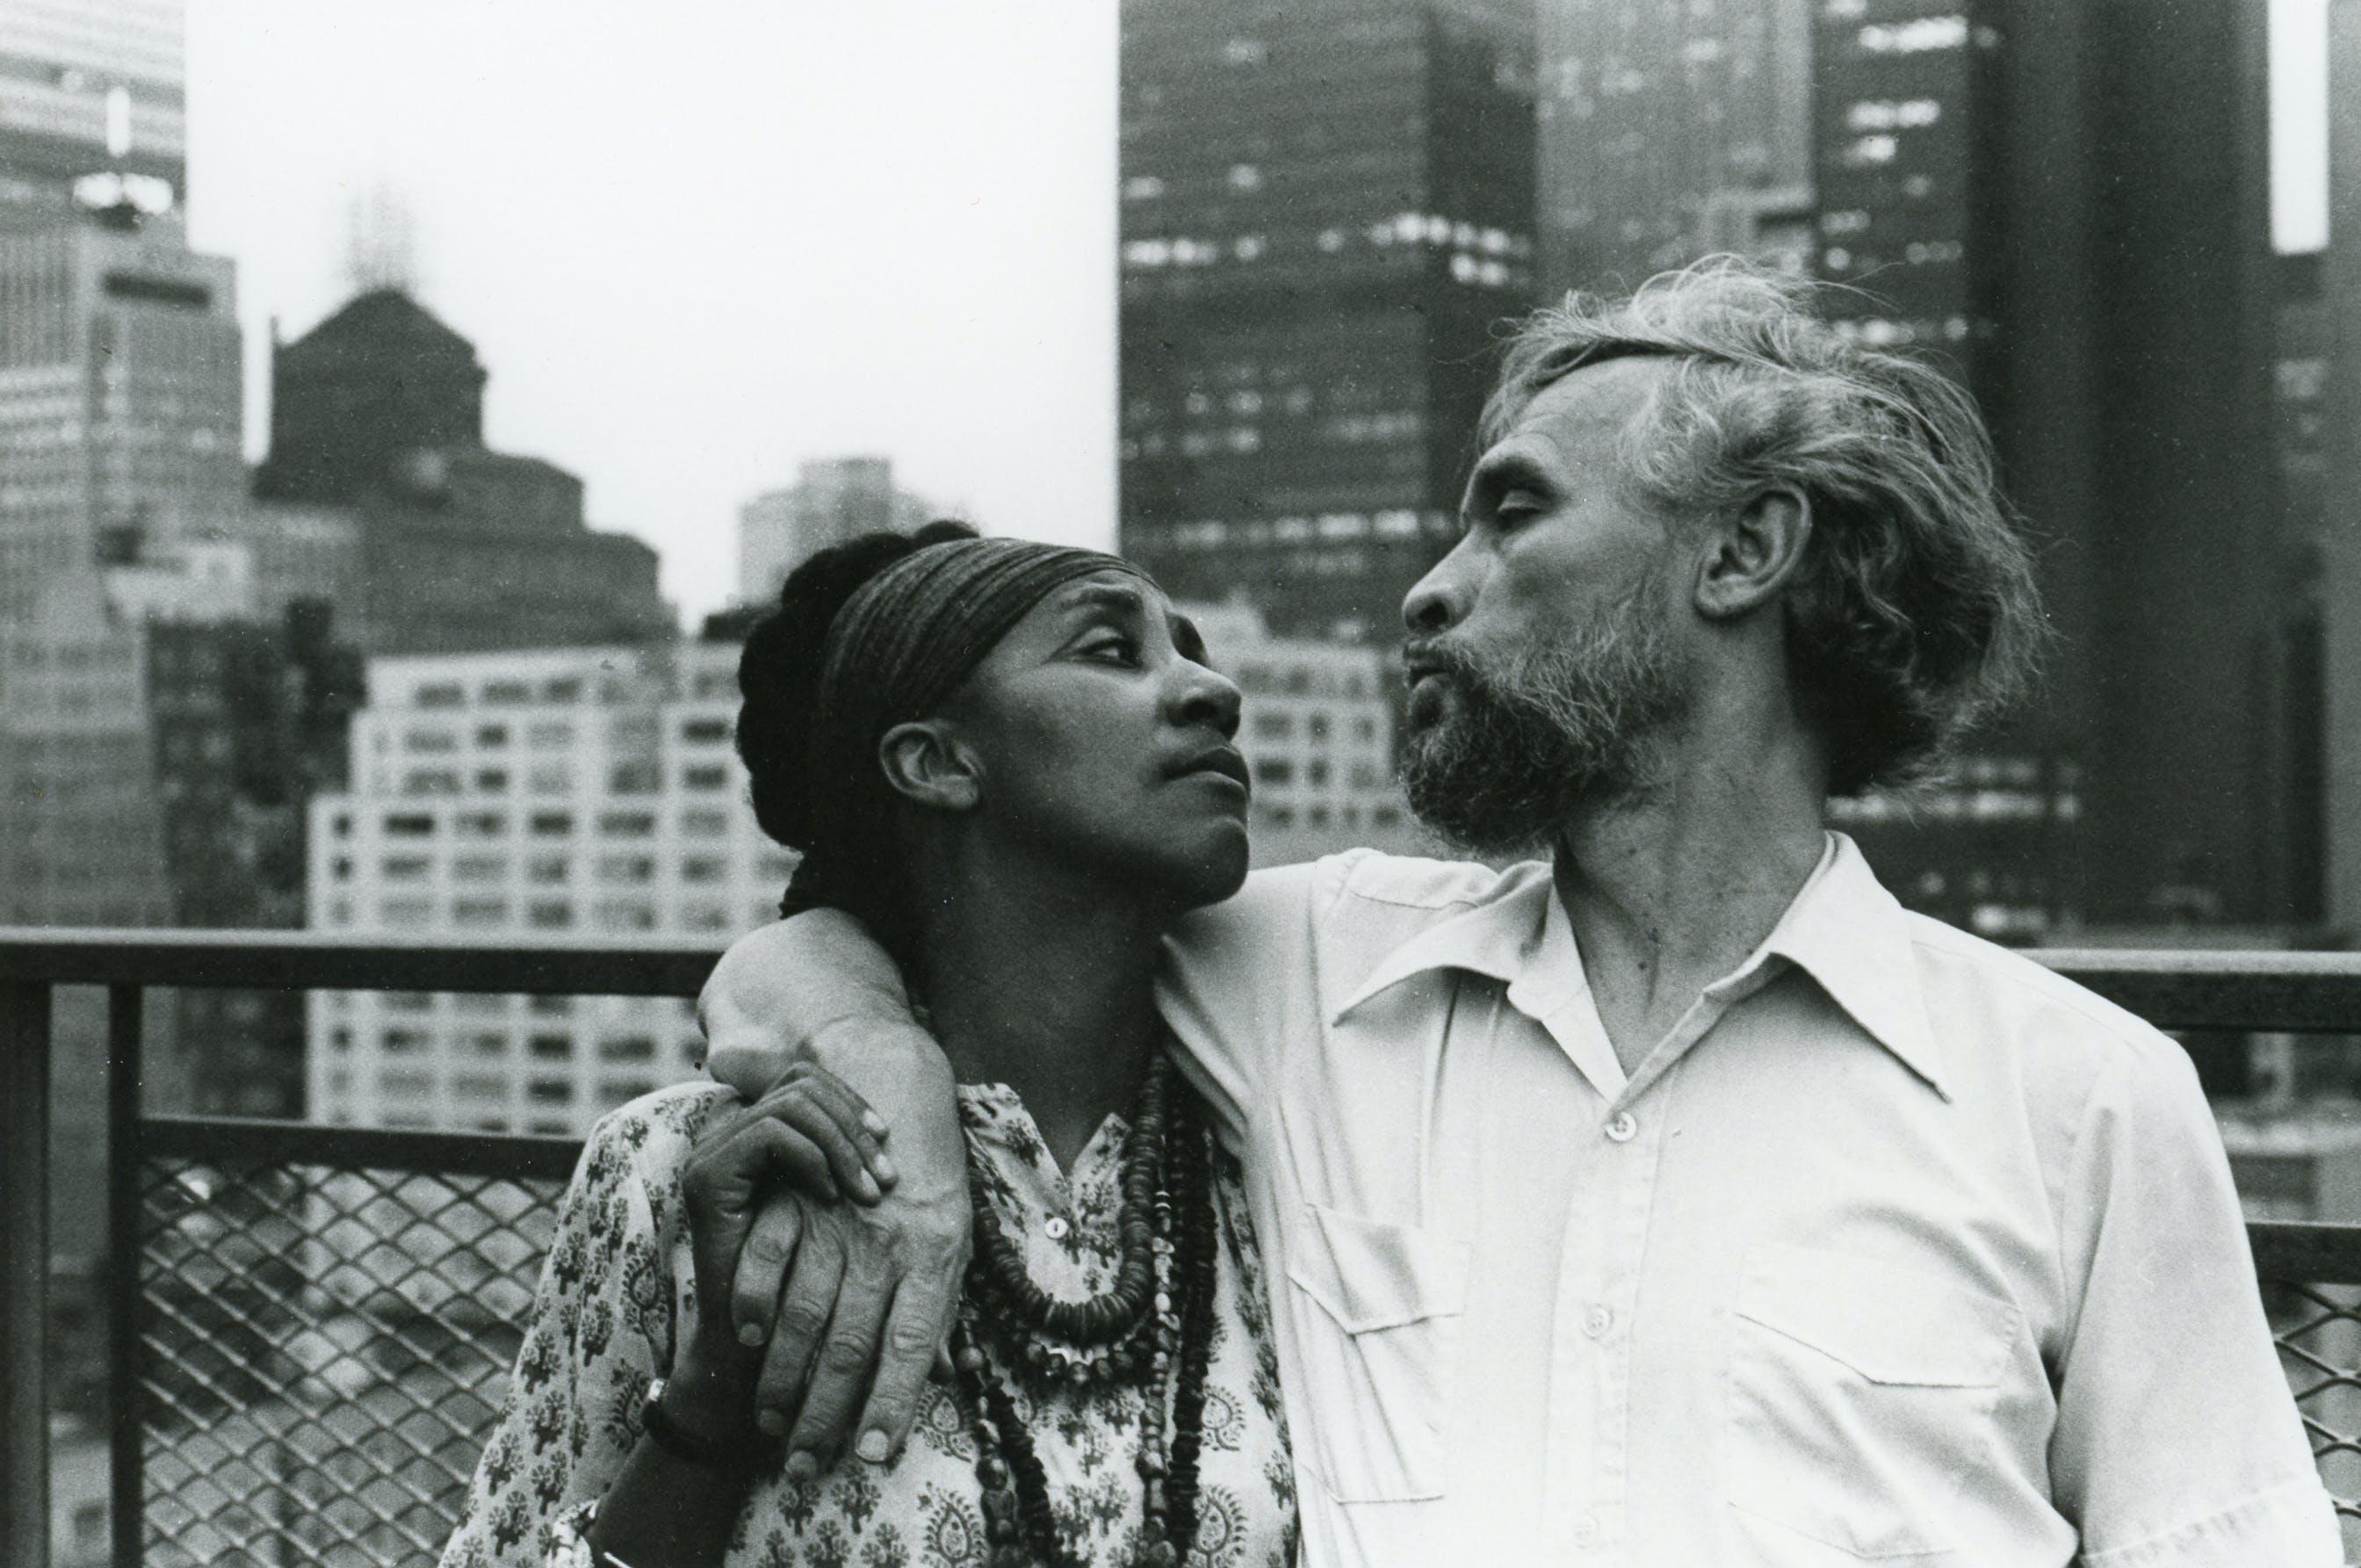 Camille Billops and James Hatch, New York City, circa 1978.